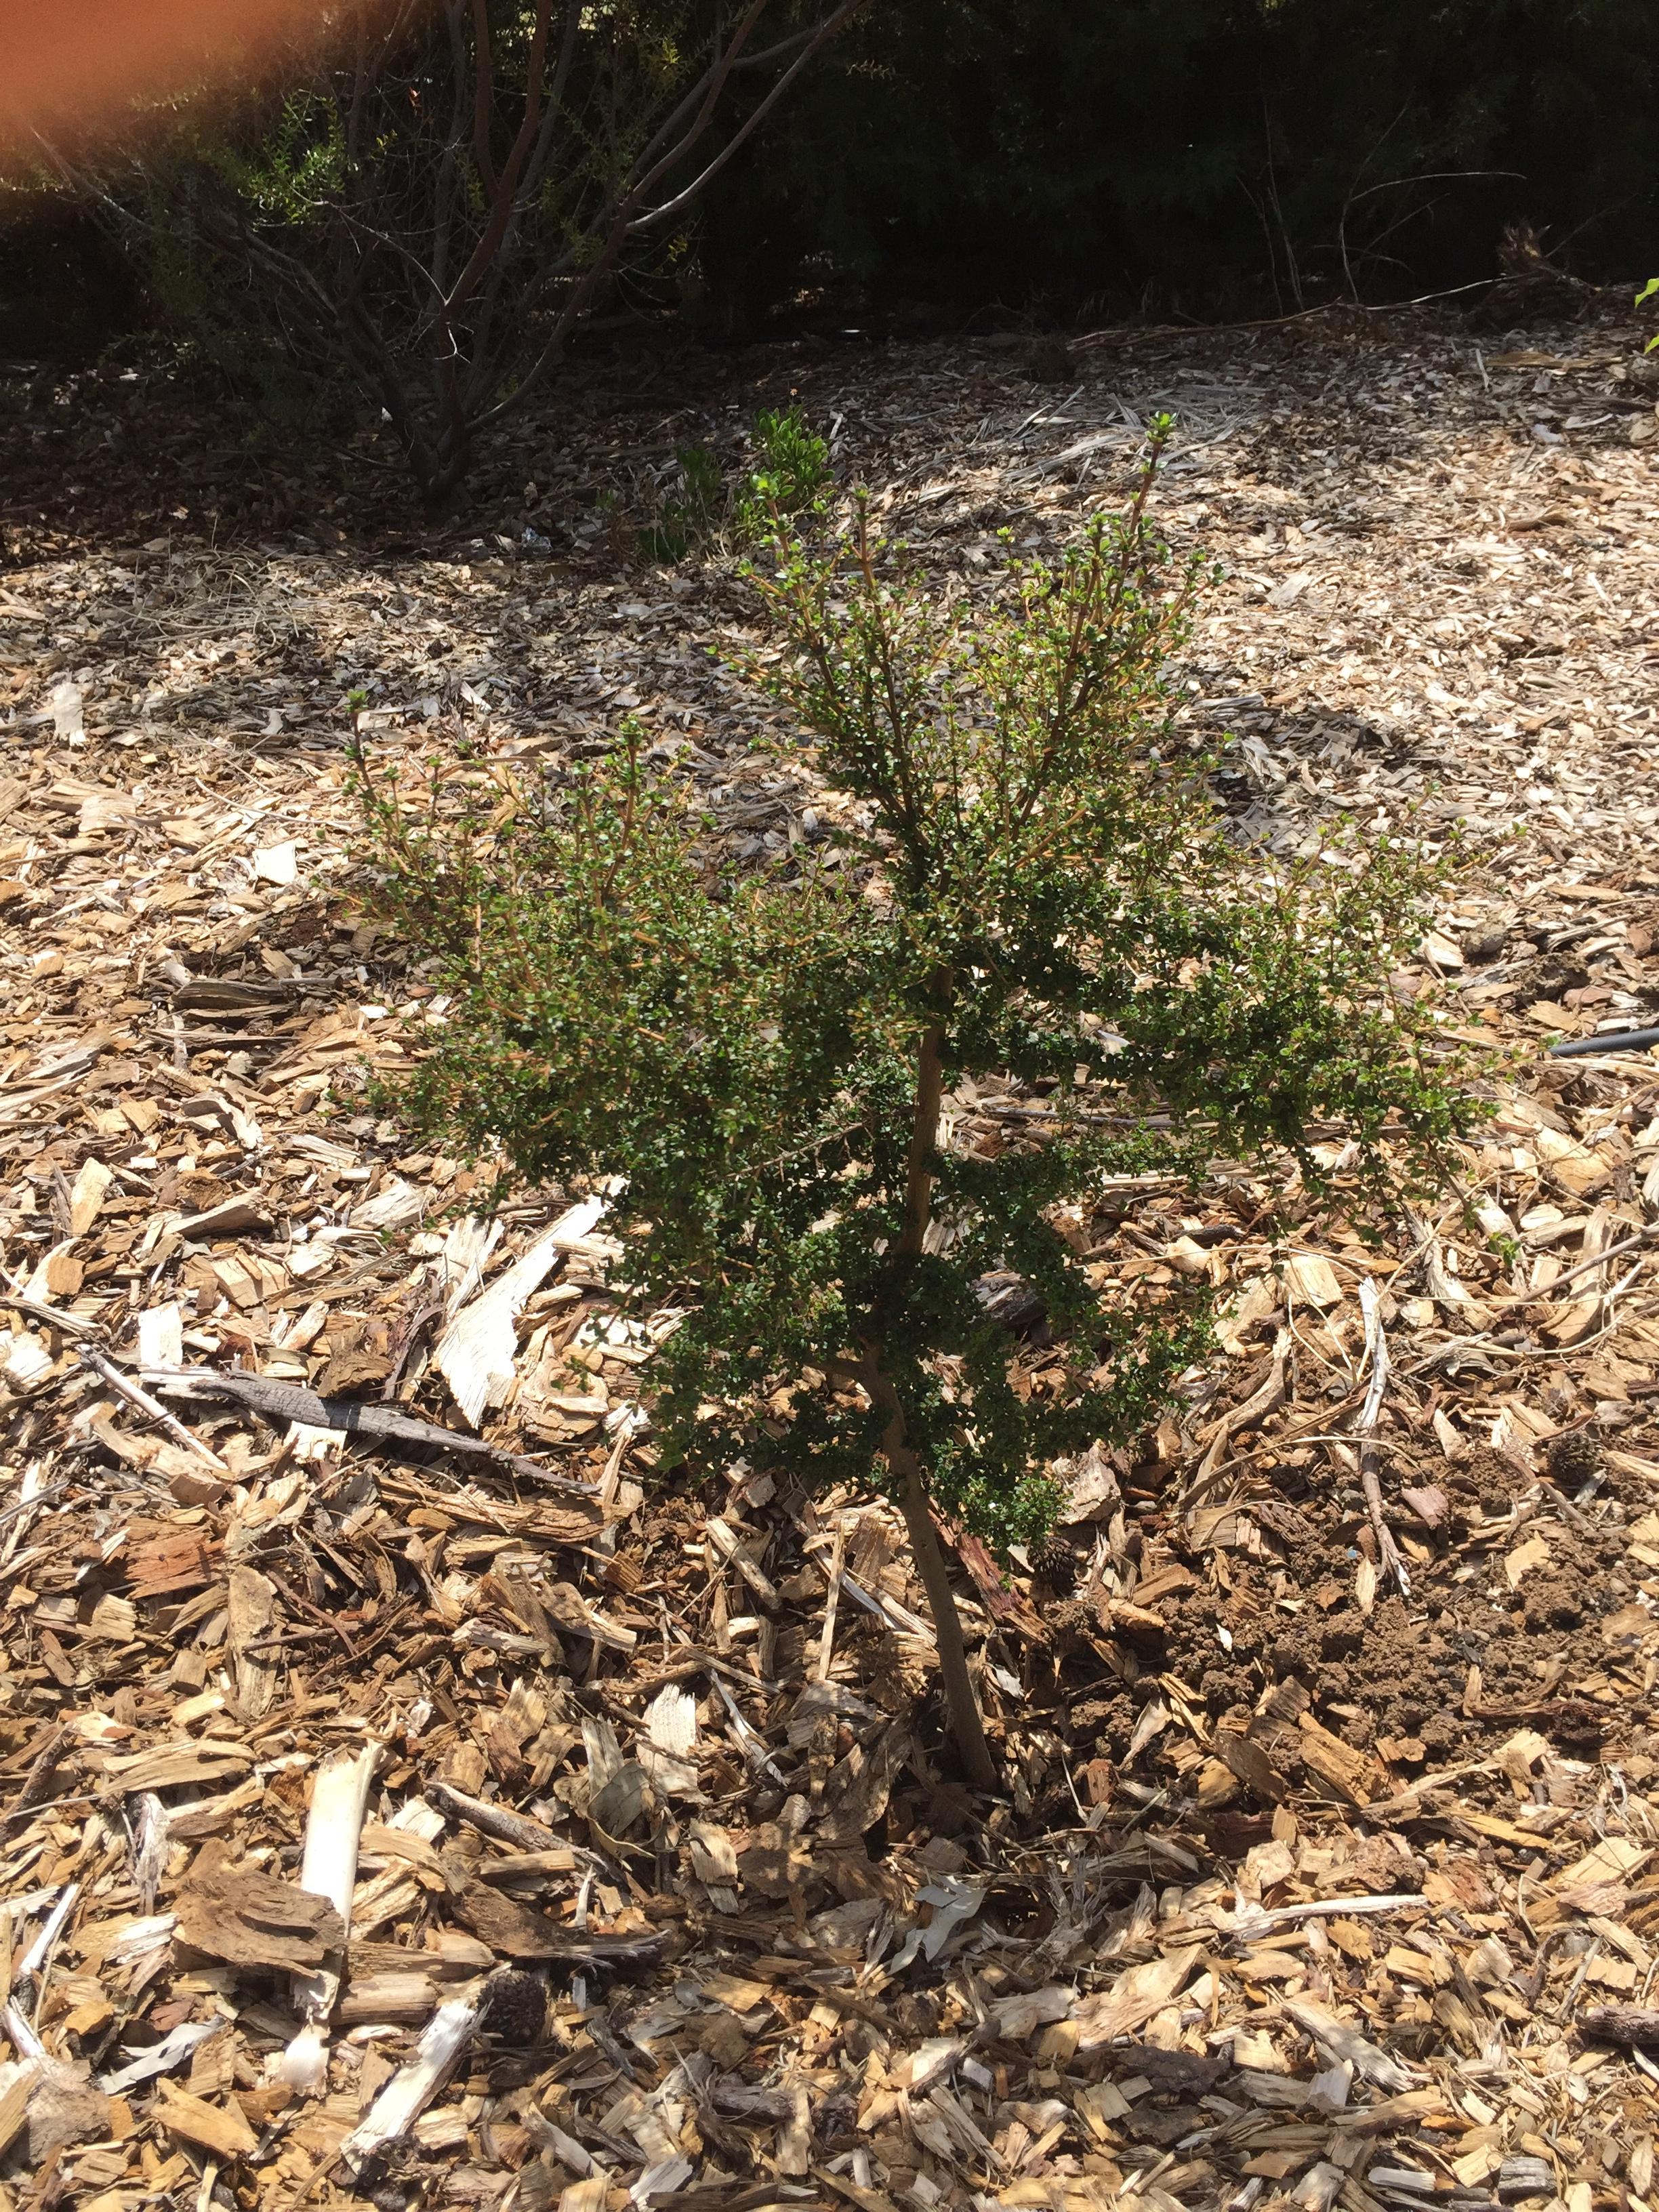 Bush – prickly current bush